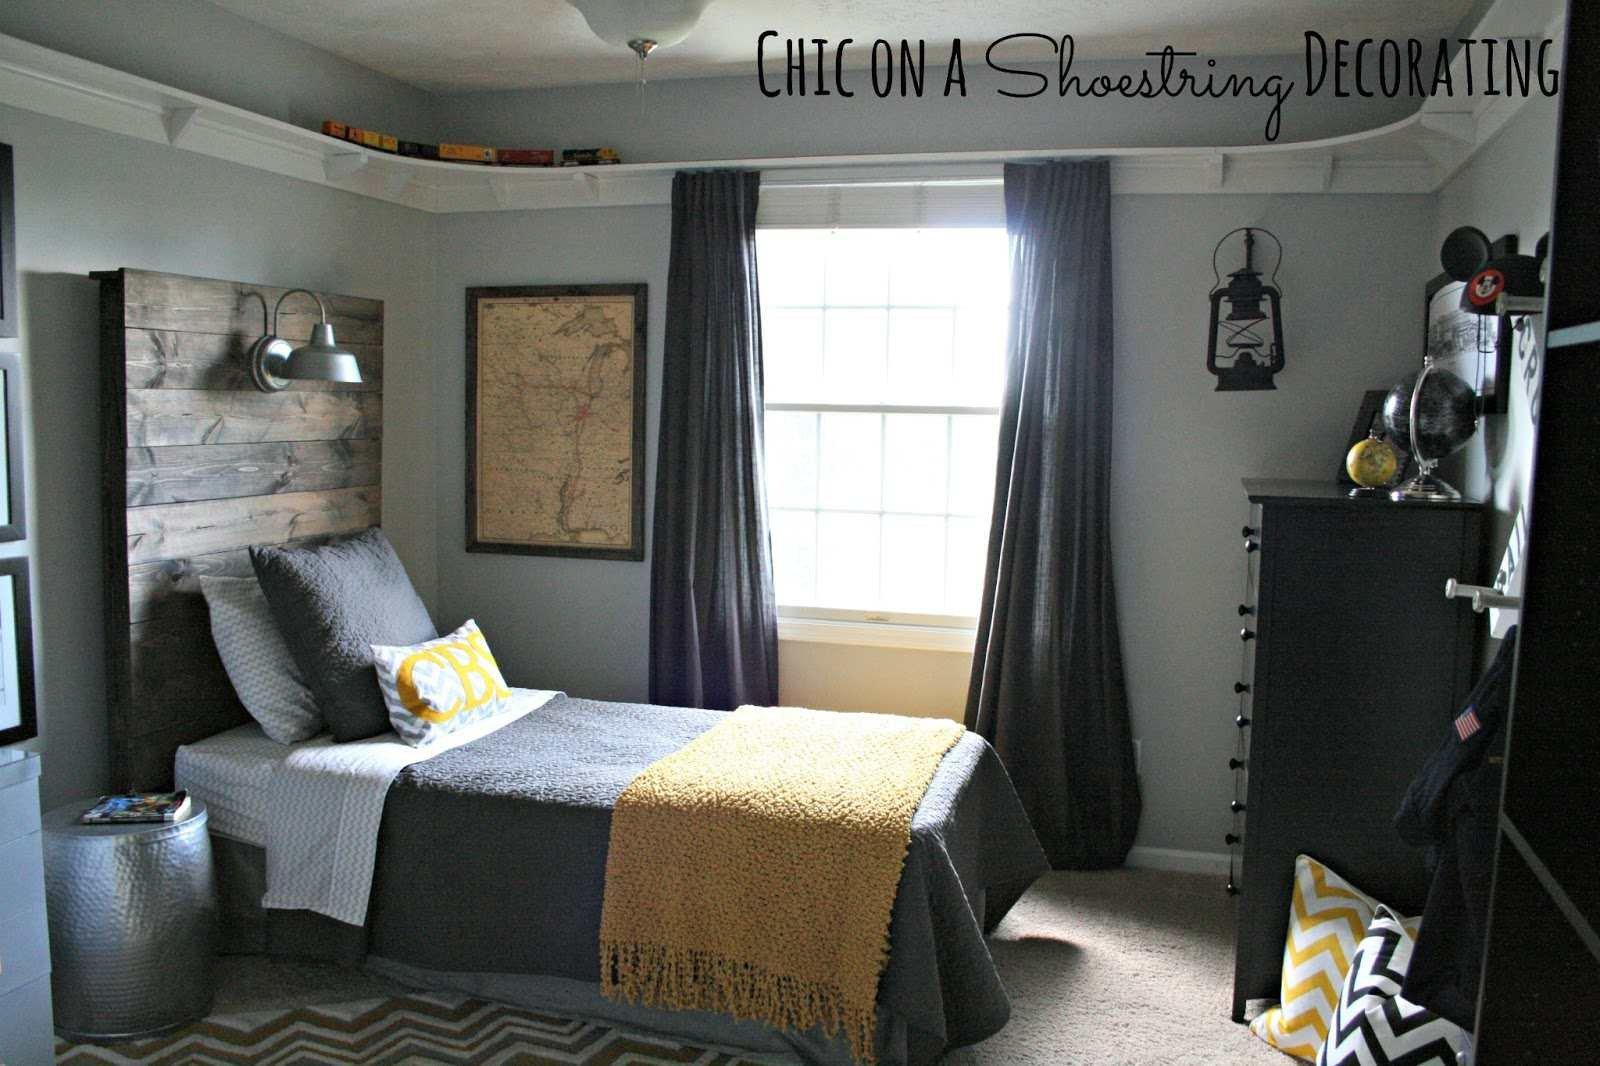 Tween Boy Bedroom Ideas Fresh 16 Creative Bedroom Ideas for Boys